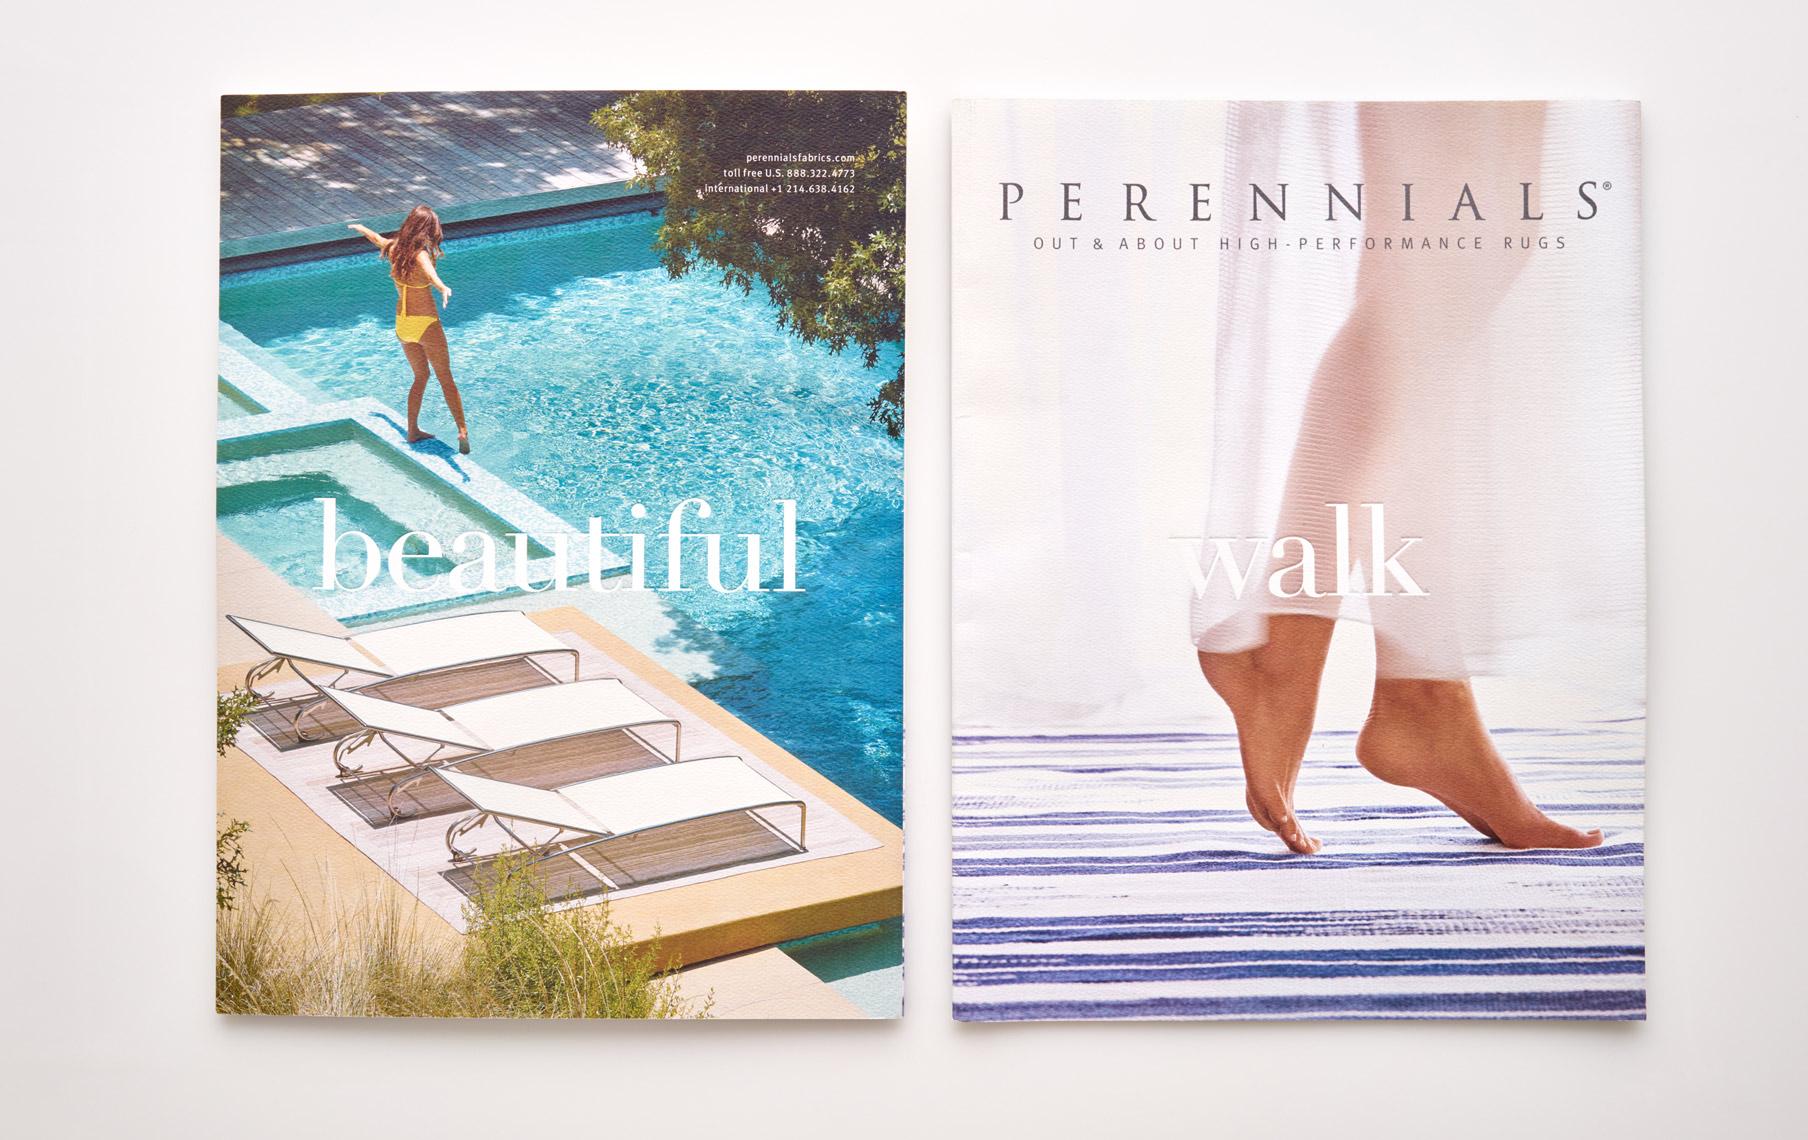 Stephen Karlisch Perennials Rugs Promotional Cover